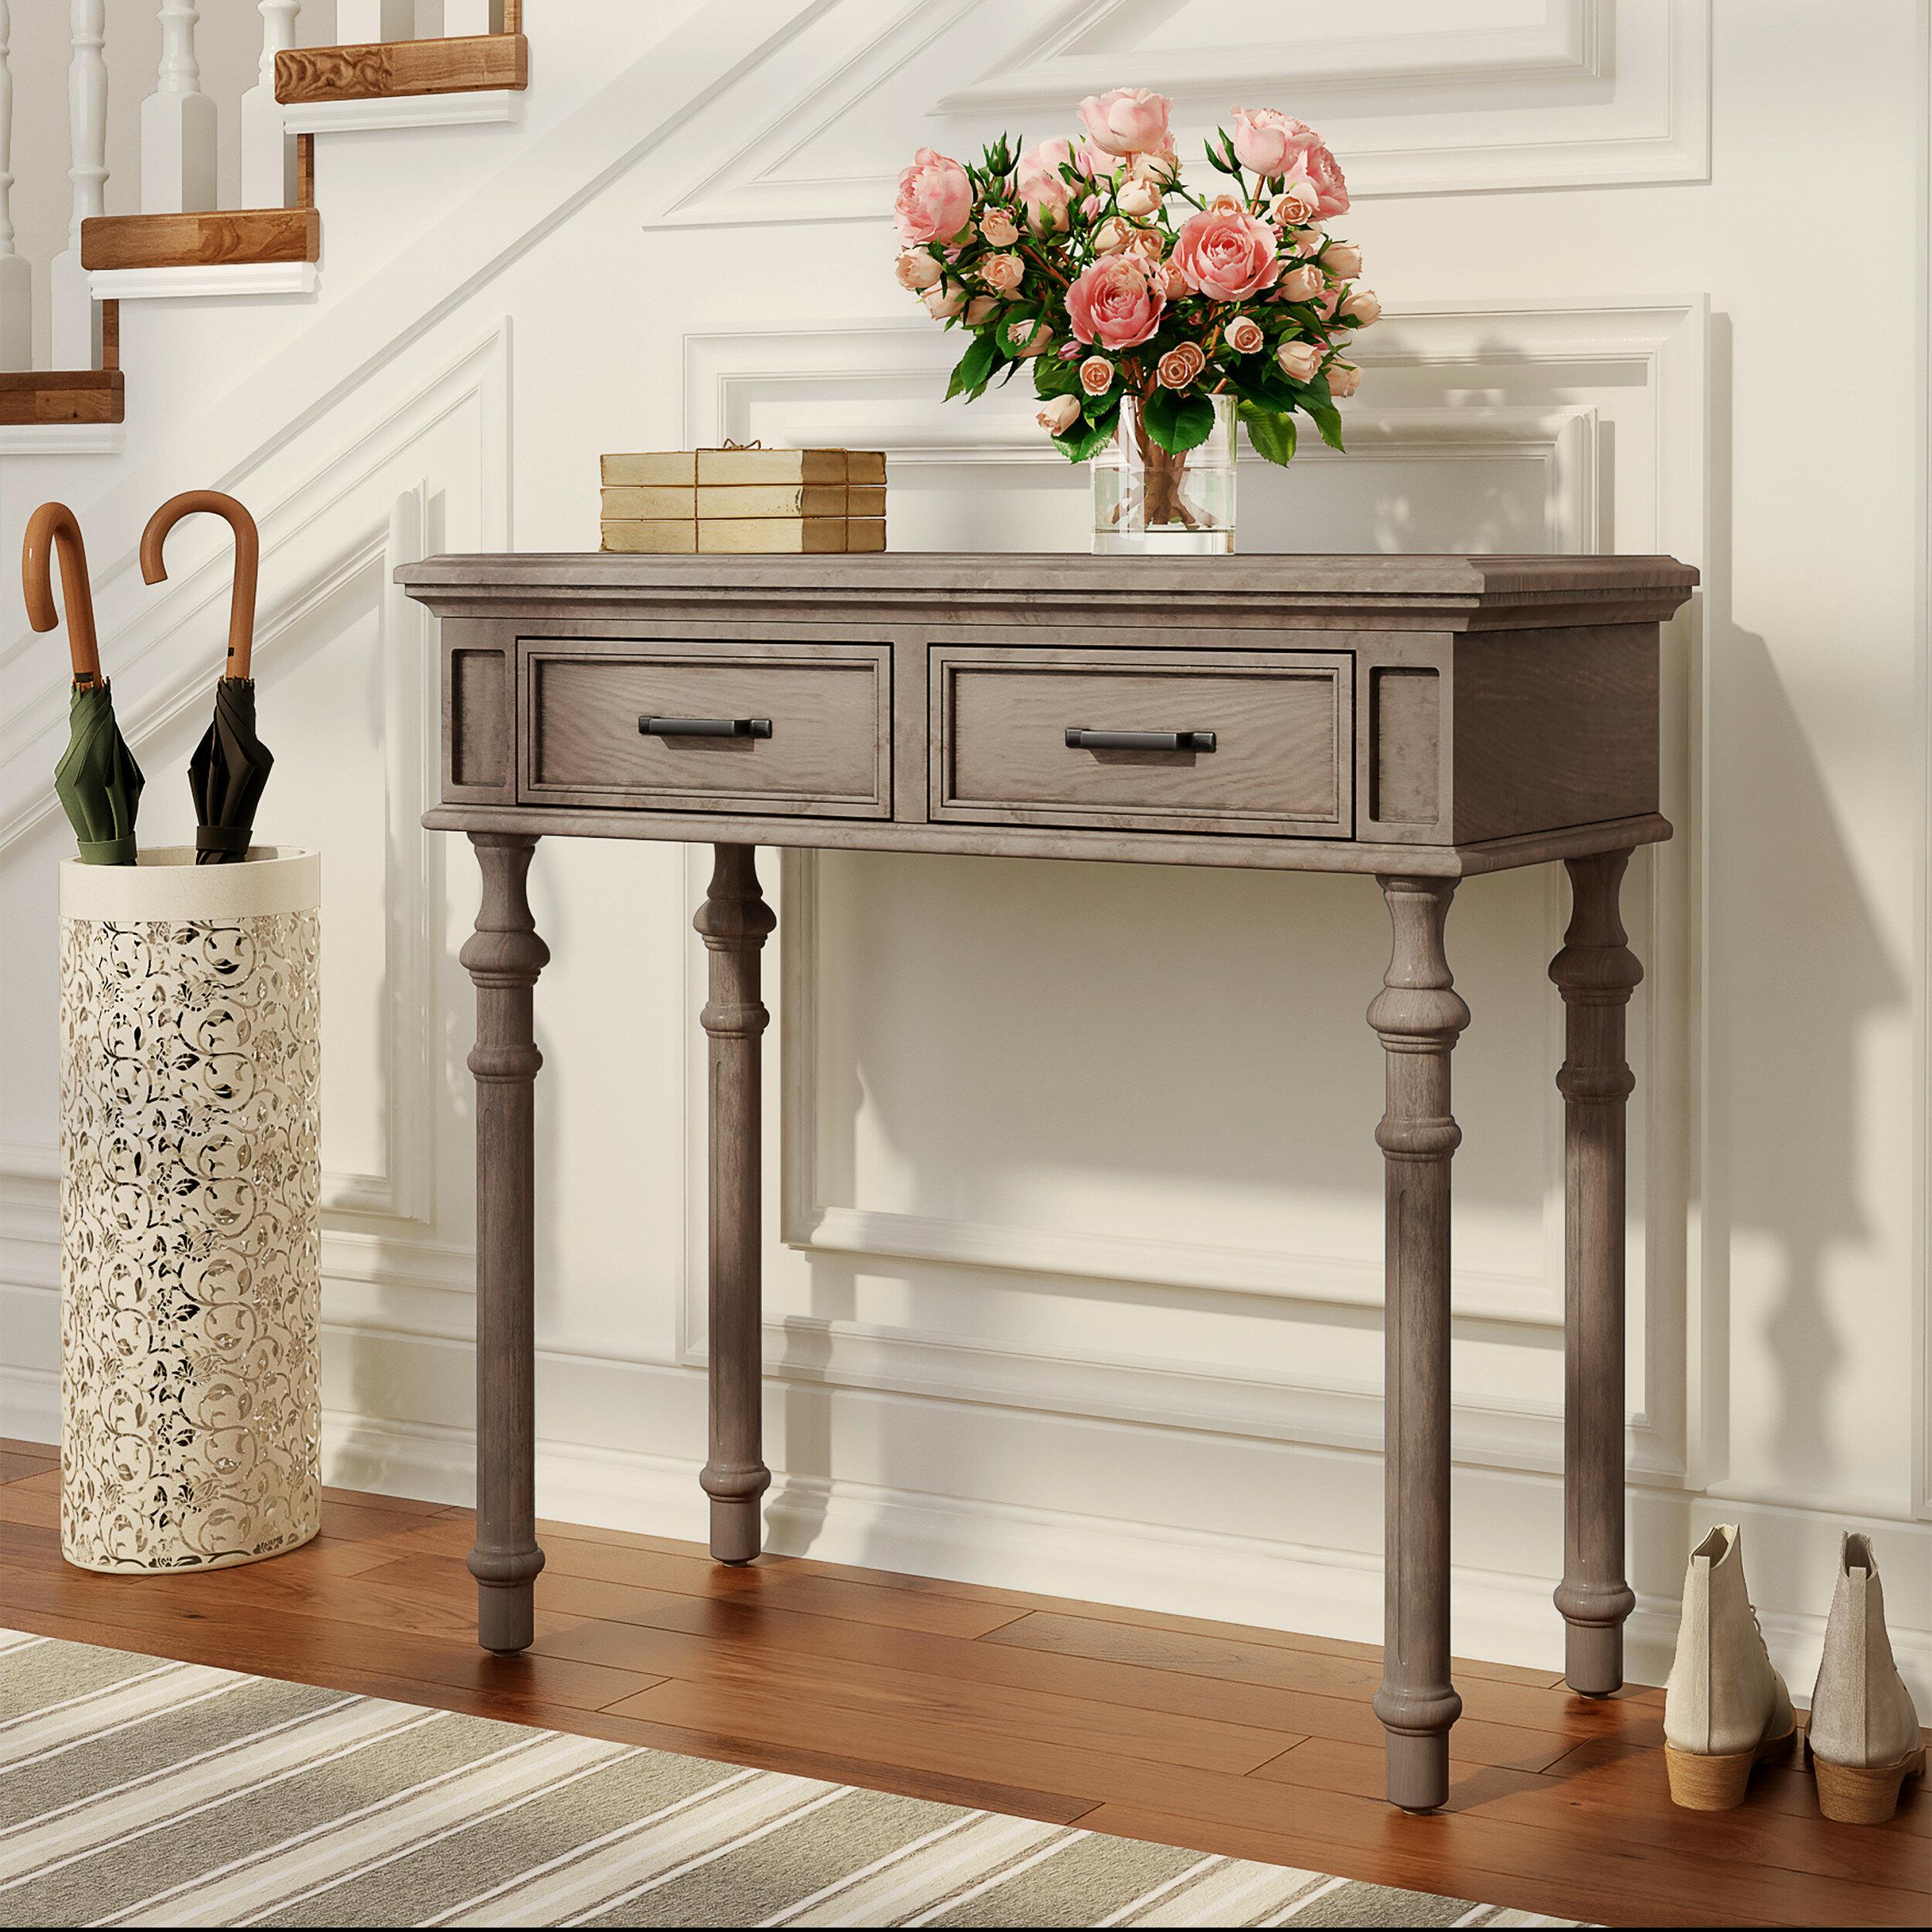 Ophelia & Co. Ursula 35'' Console Table | Wayfair